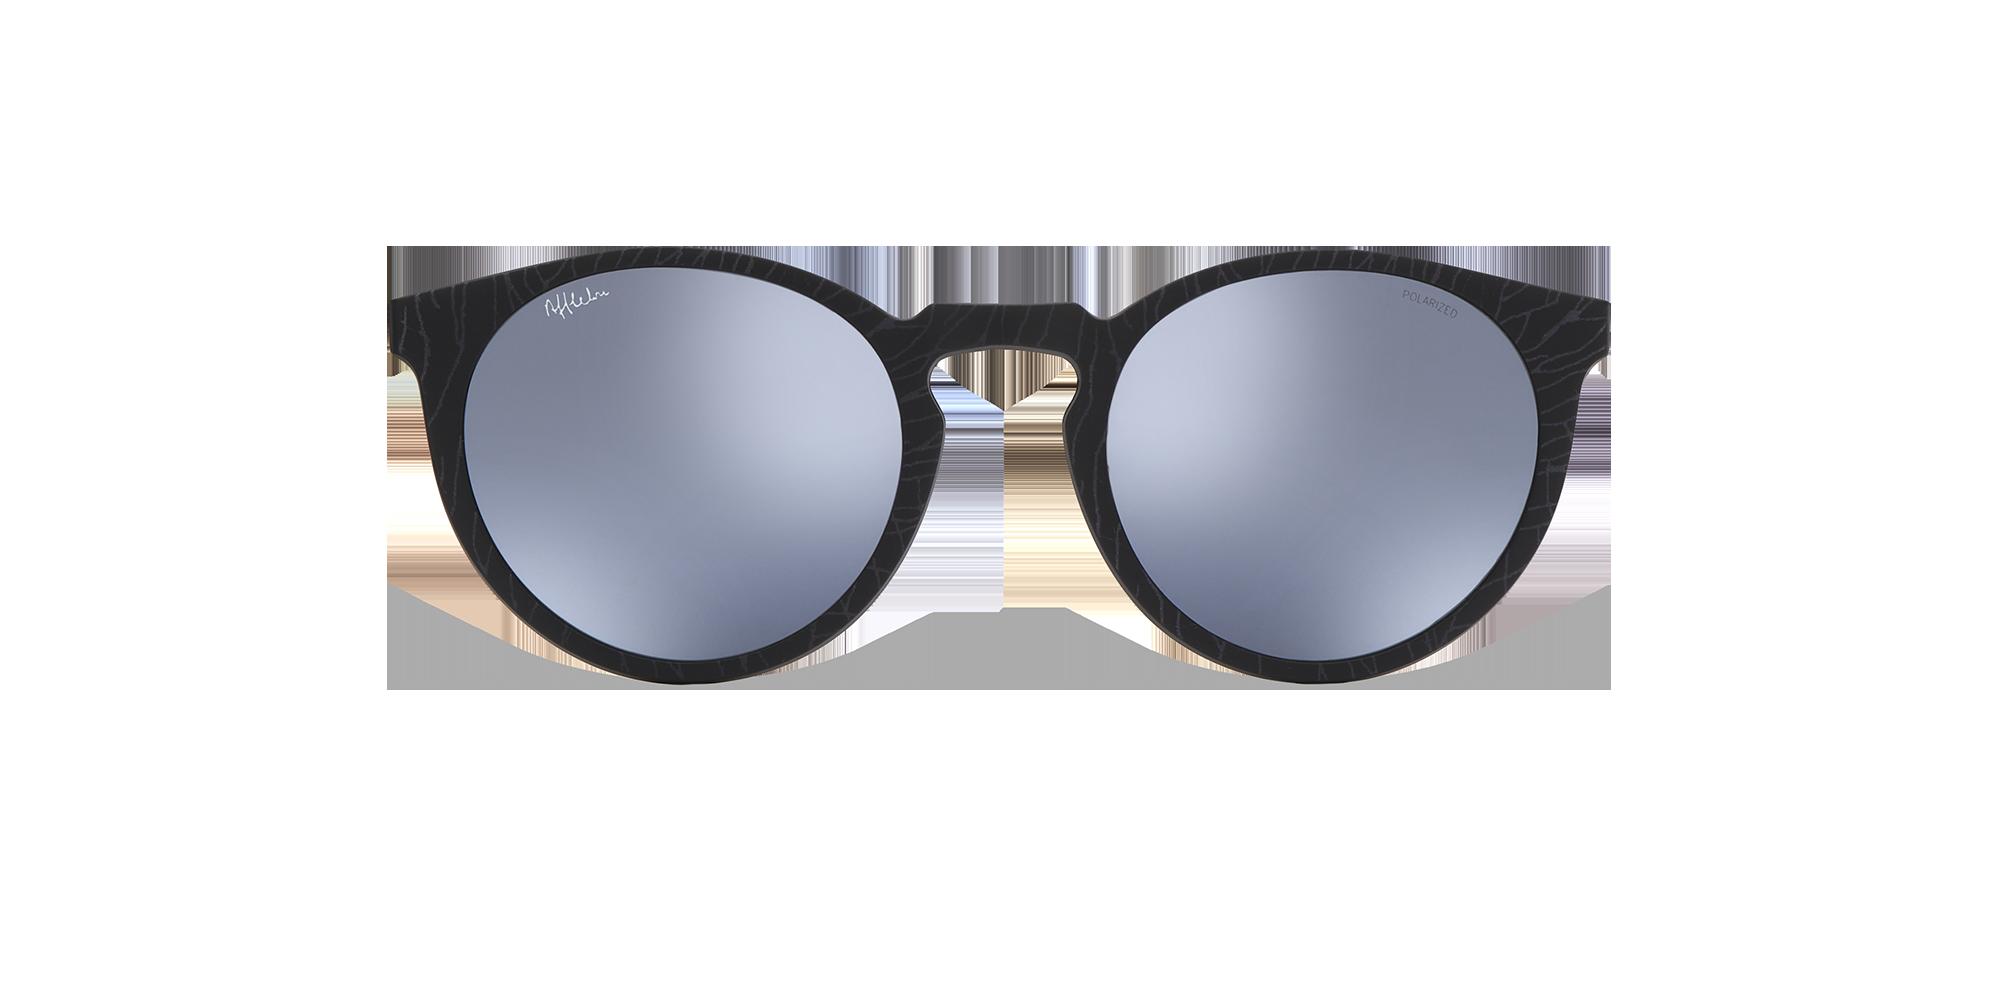 afflelou/france/products/smart_clip/clips_glasses/TMK35PRBK014820.png